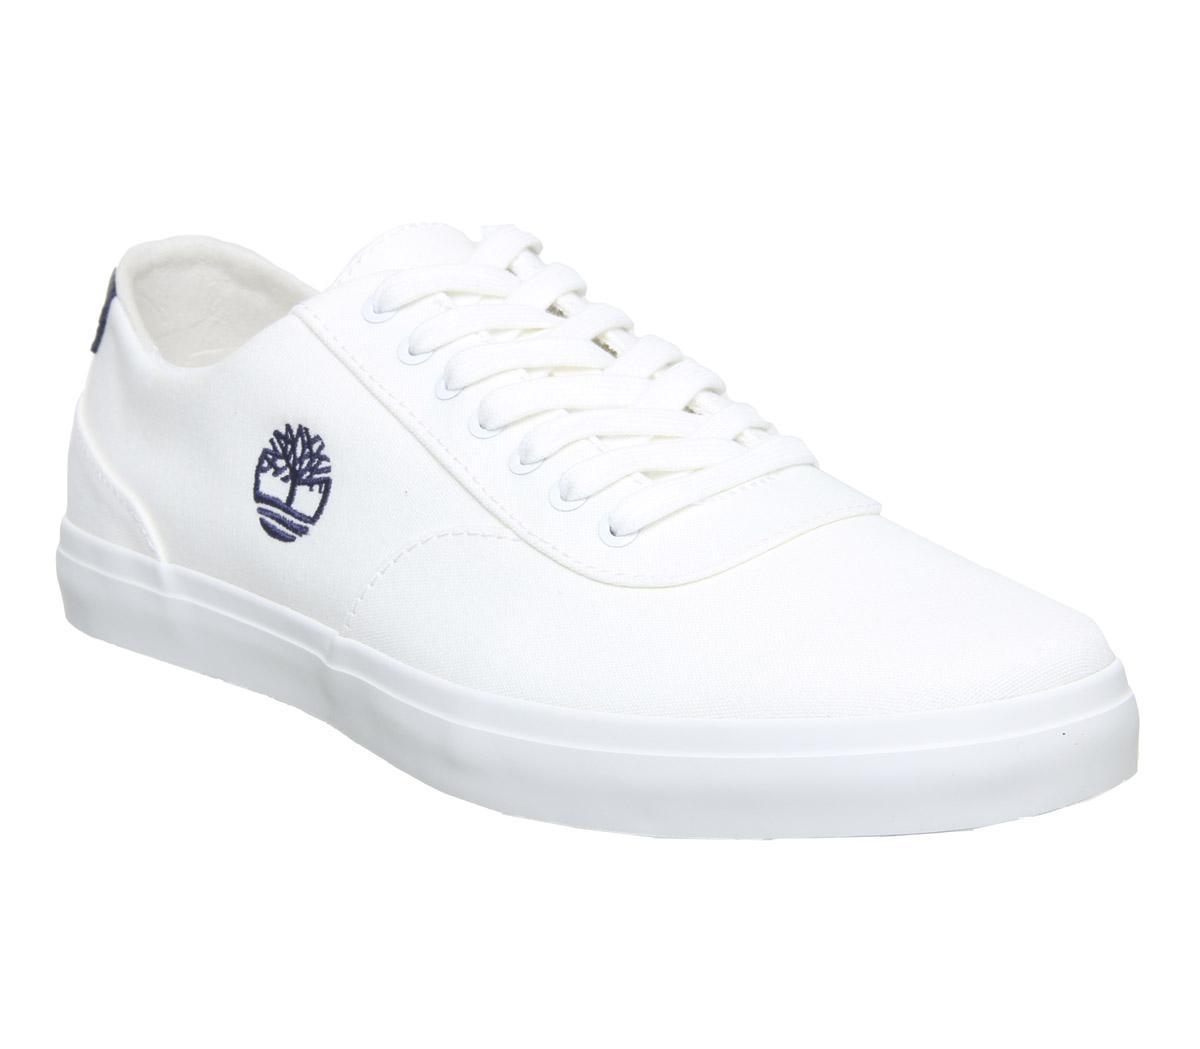 Union Sneaker Exclusive